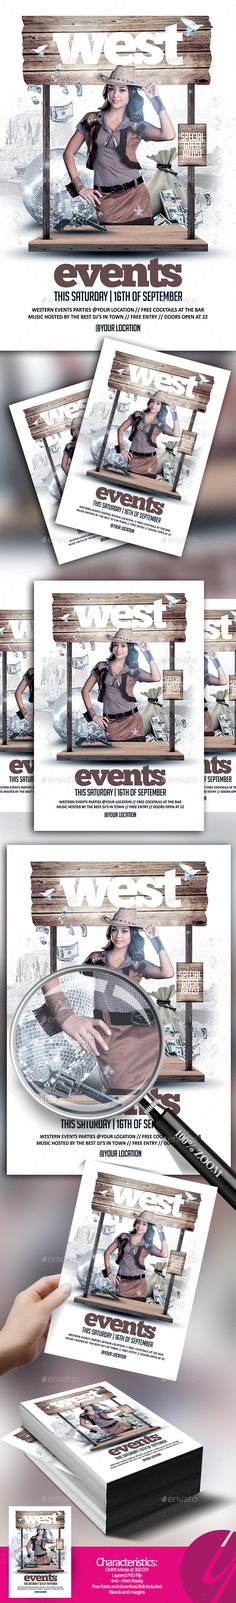 Western Events Flyer — Photoshop PSD #theme #gun poweder • Download ➝ https://graphicriver.net/item/western-events-flyer/20286553?ref=pxcr